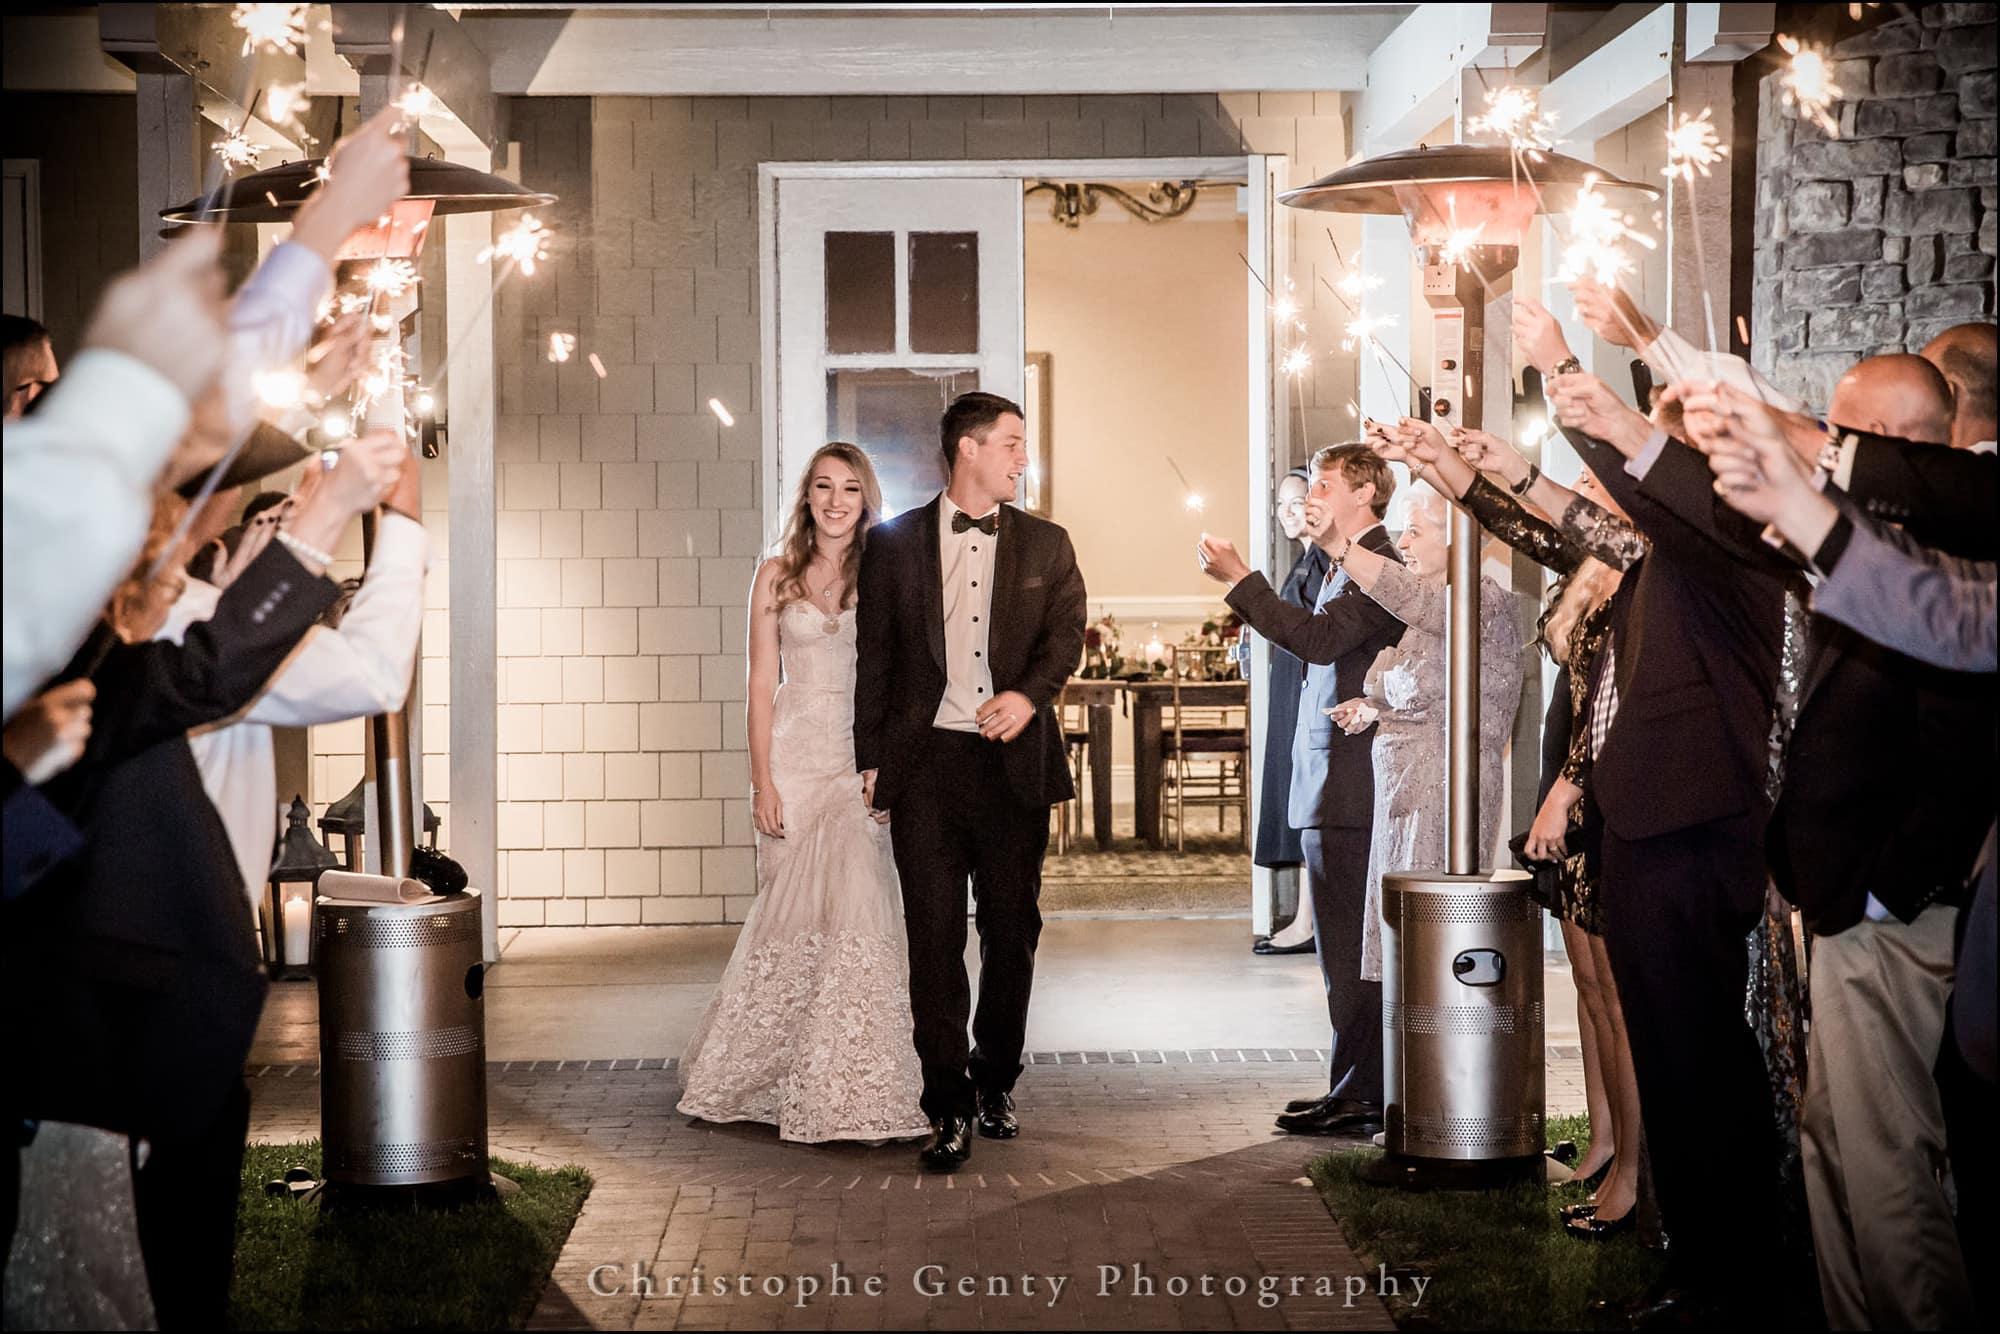 Wedding Photography at The Ritz-Carlton in Half Moon Bay